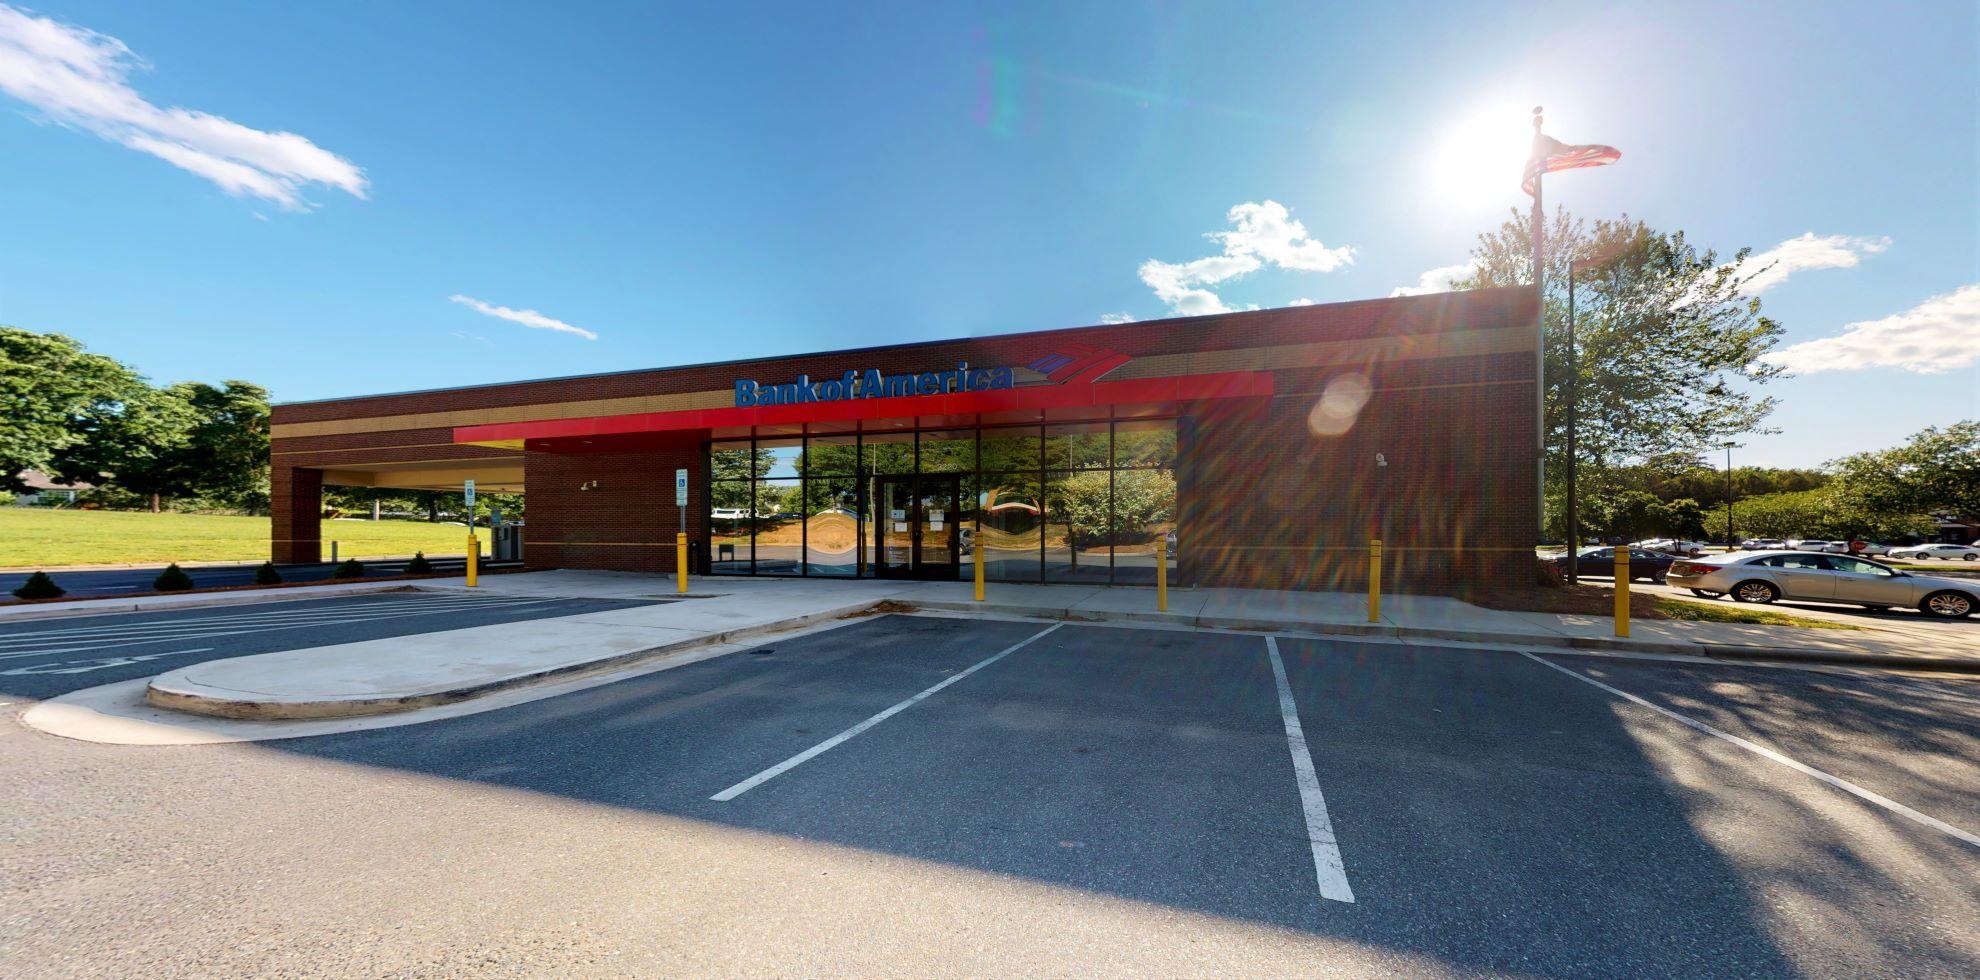 Bank of America financial center with drive-thru ATM | 3220 Weddington Rd, Matthews, NC 28105